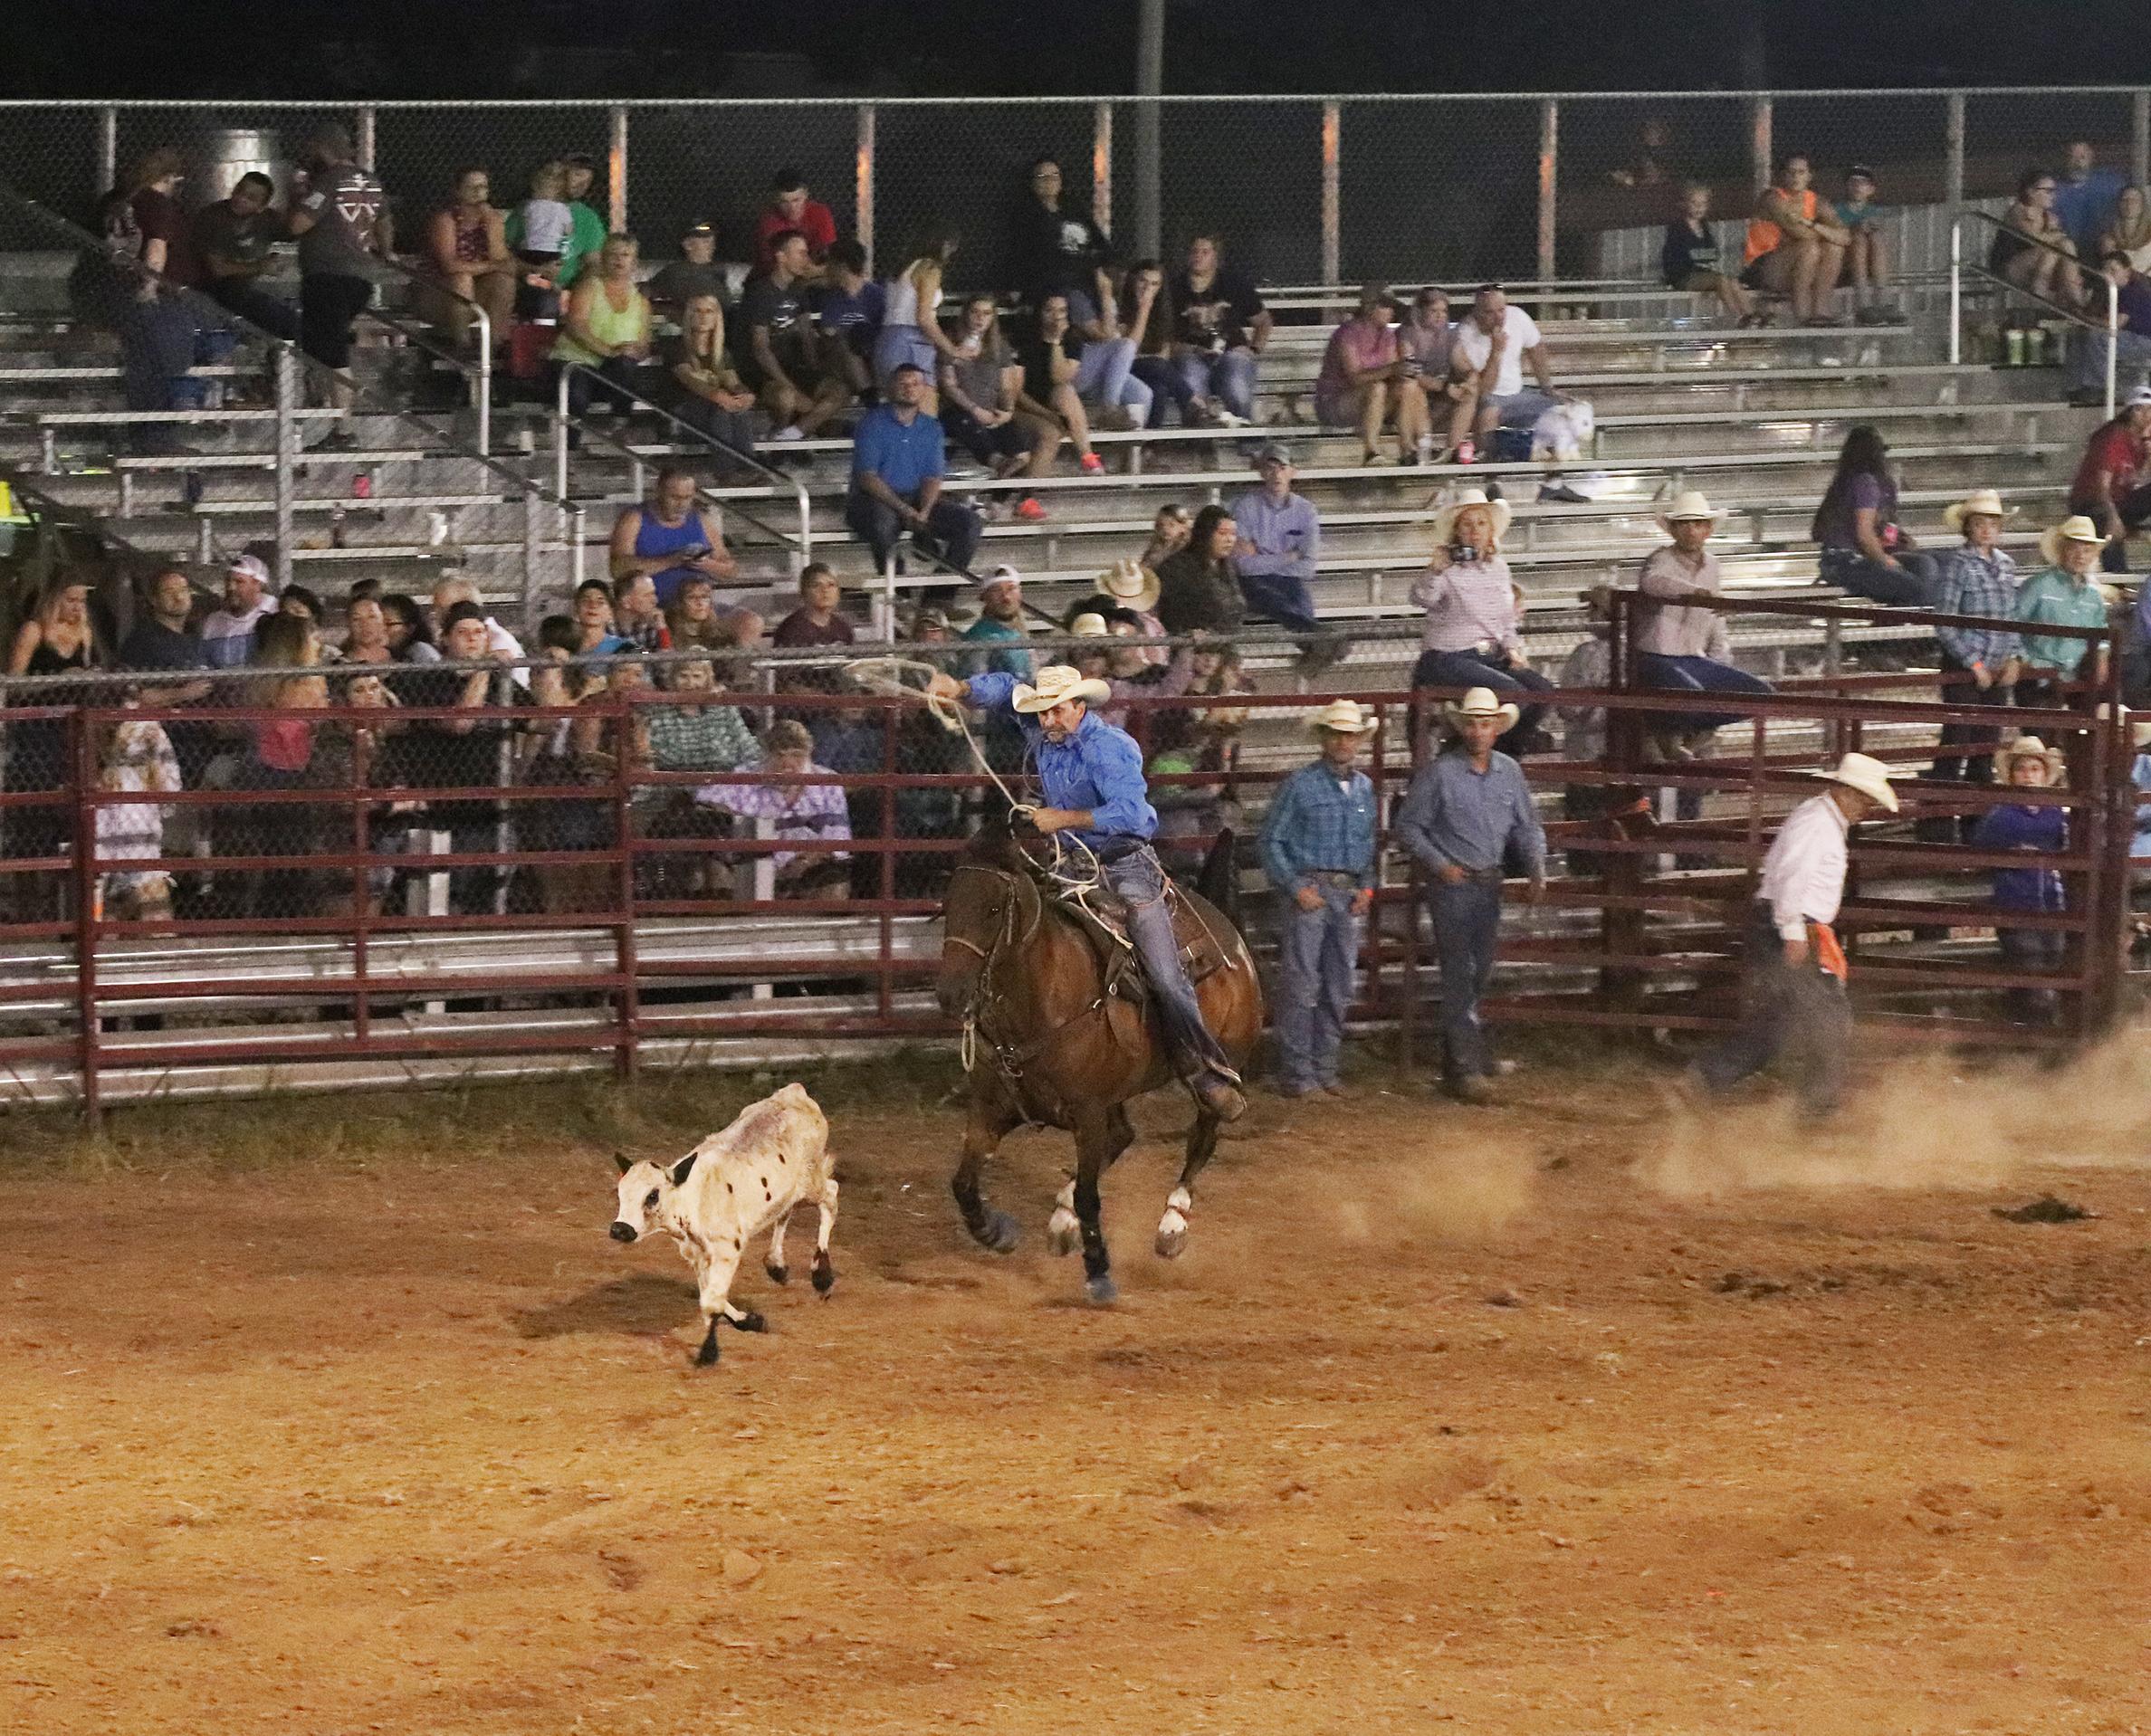 Rodeo 4.jpg